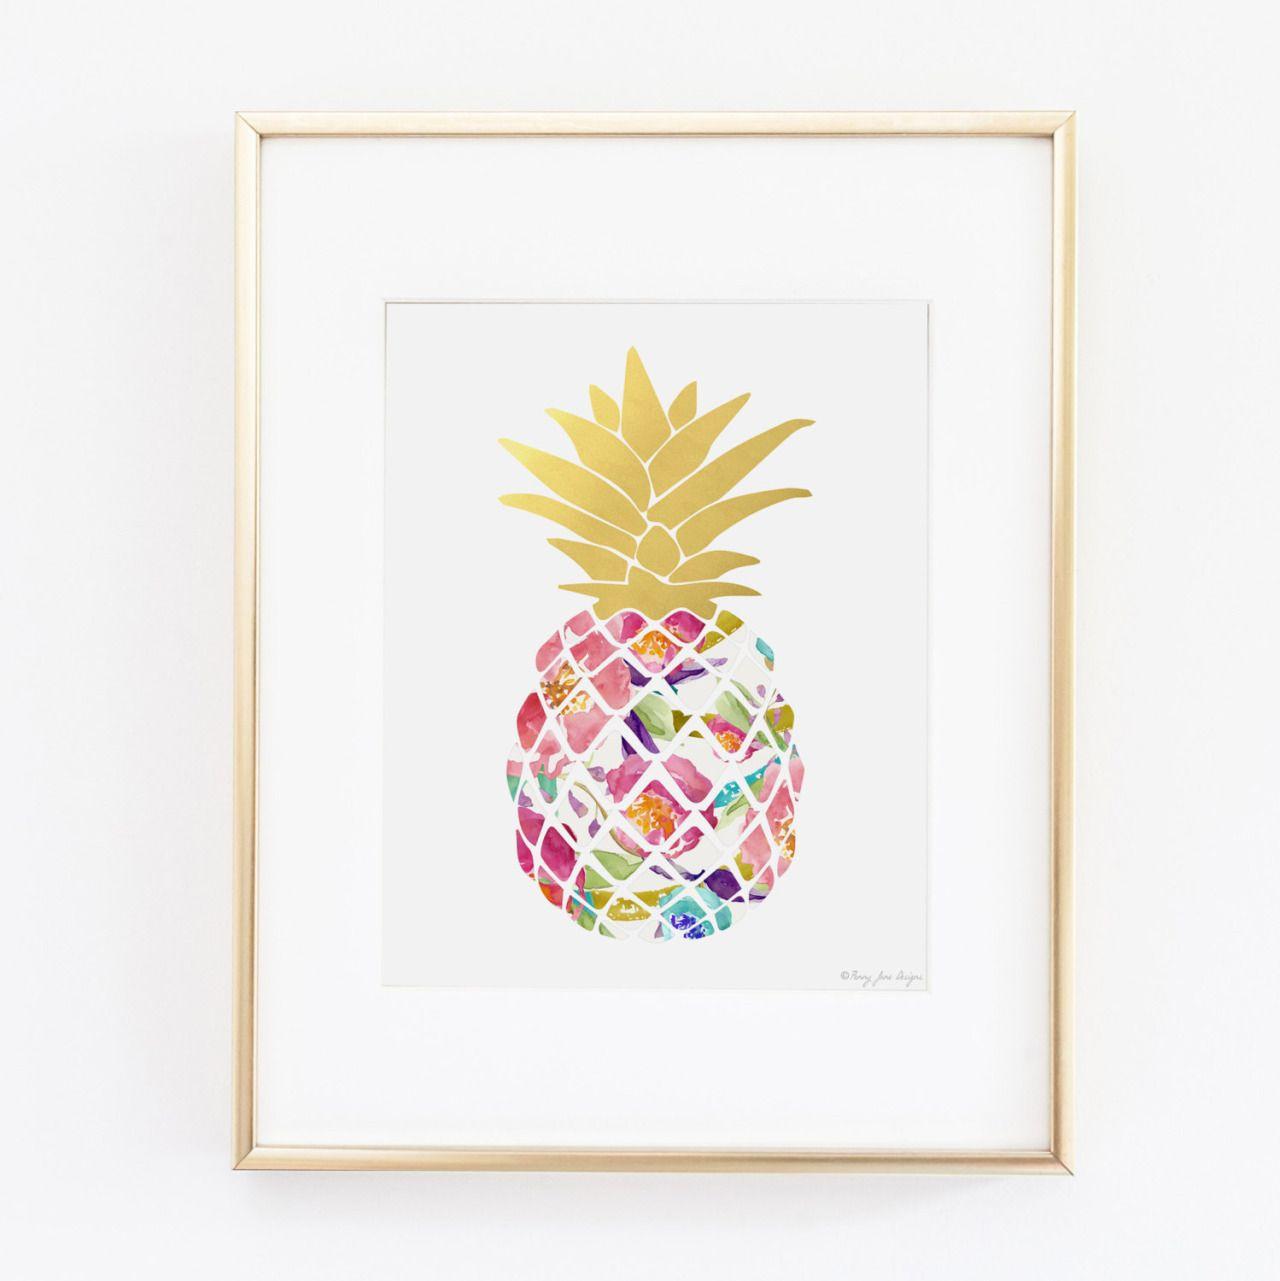 Wall Art Design Ideas, Colroful Fruit Pineapple Wall Art Throughout Pineapple Wall Decor (View 9 of 30)